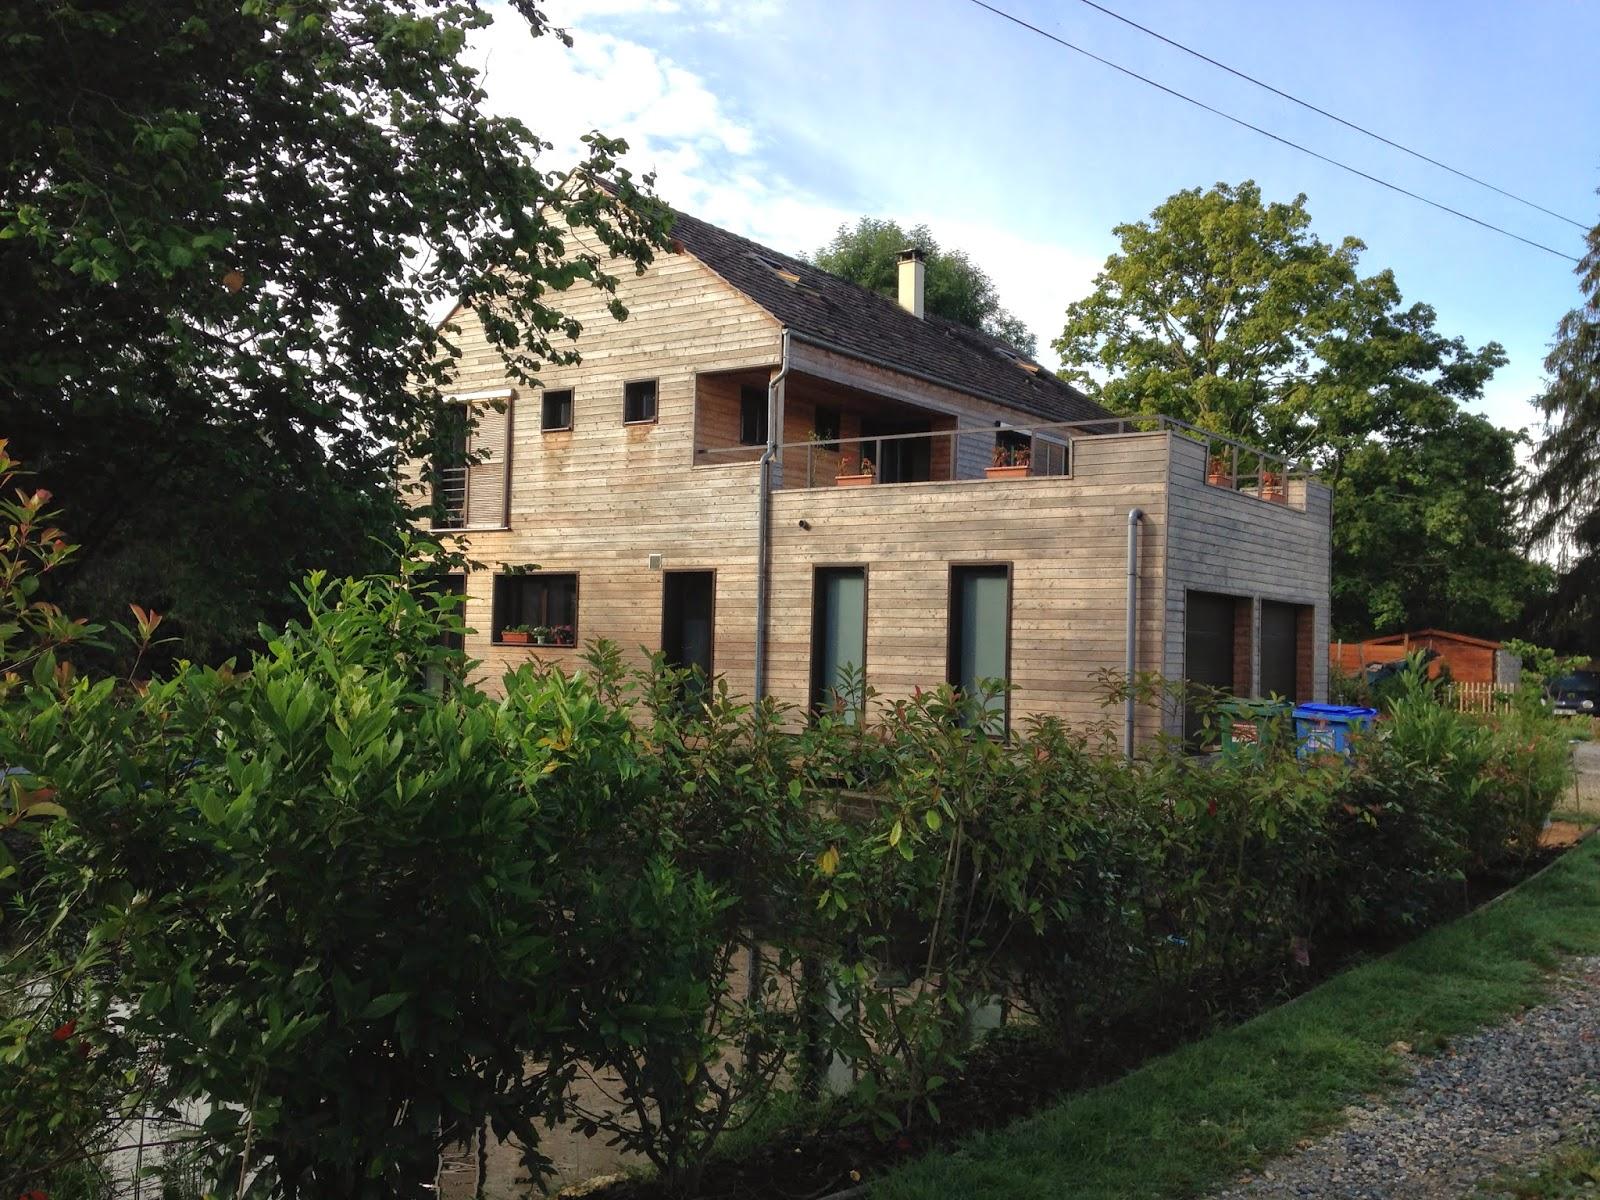 Maison bois cernay en bardage red cedar architecte for Architecte maison en bois